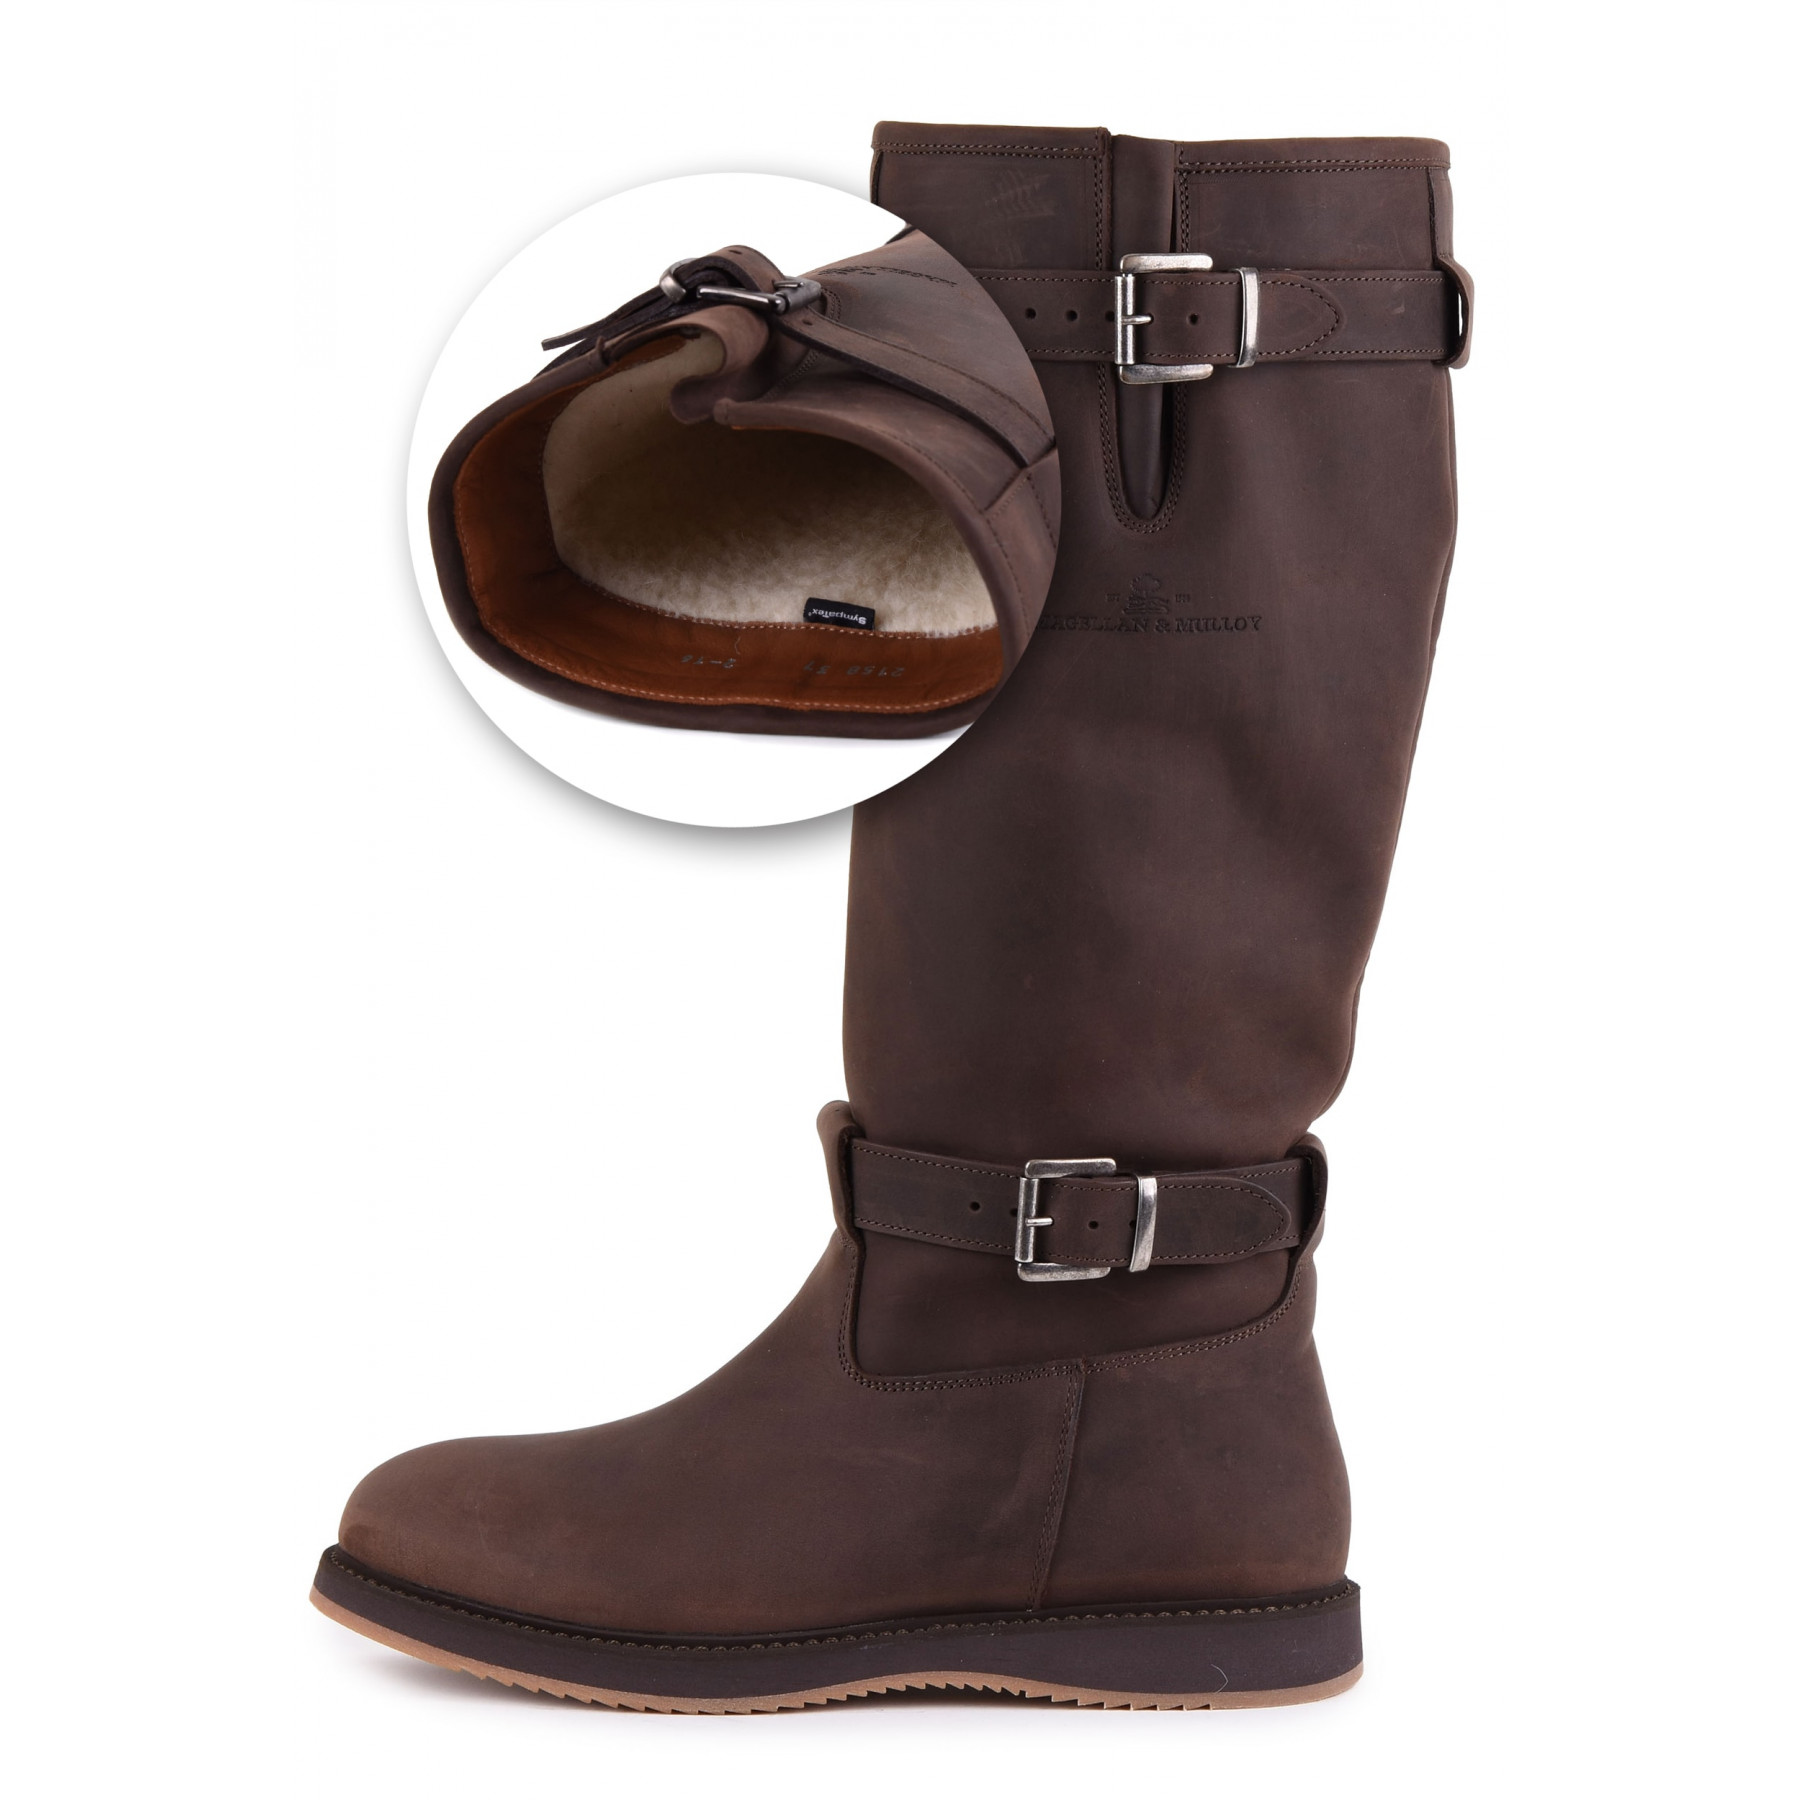 Magellan & Mulloy Xscape Denver Lamb Lining Brown, brown ladies outdoor boot